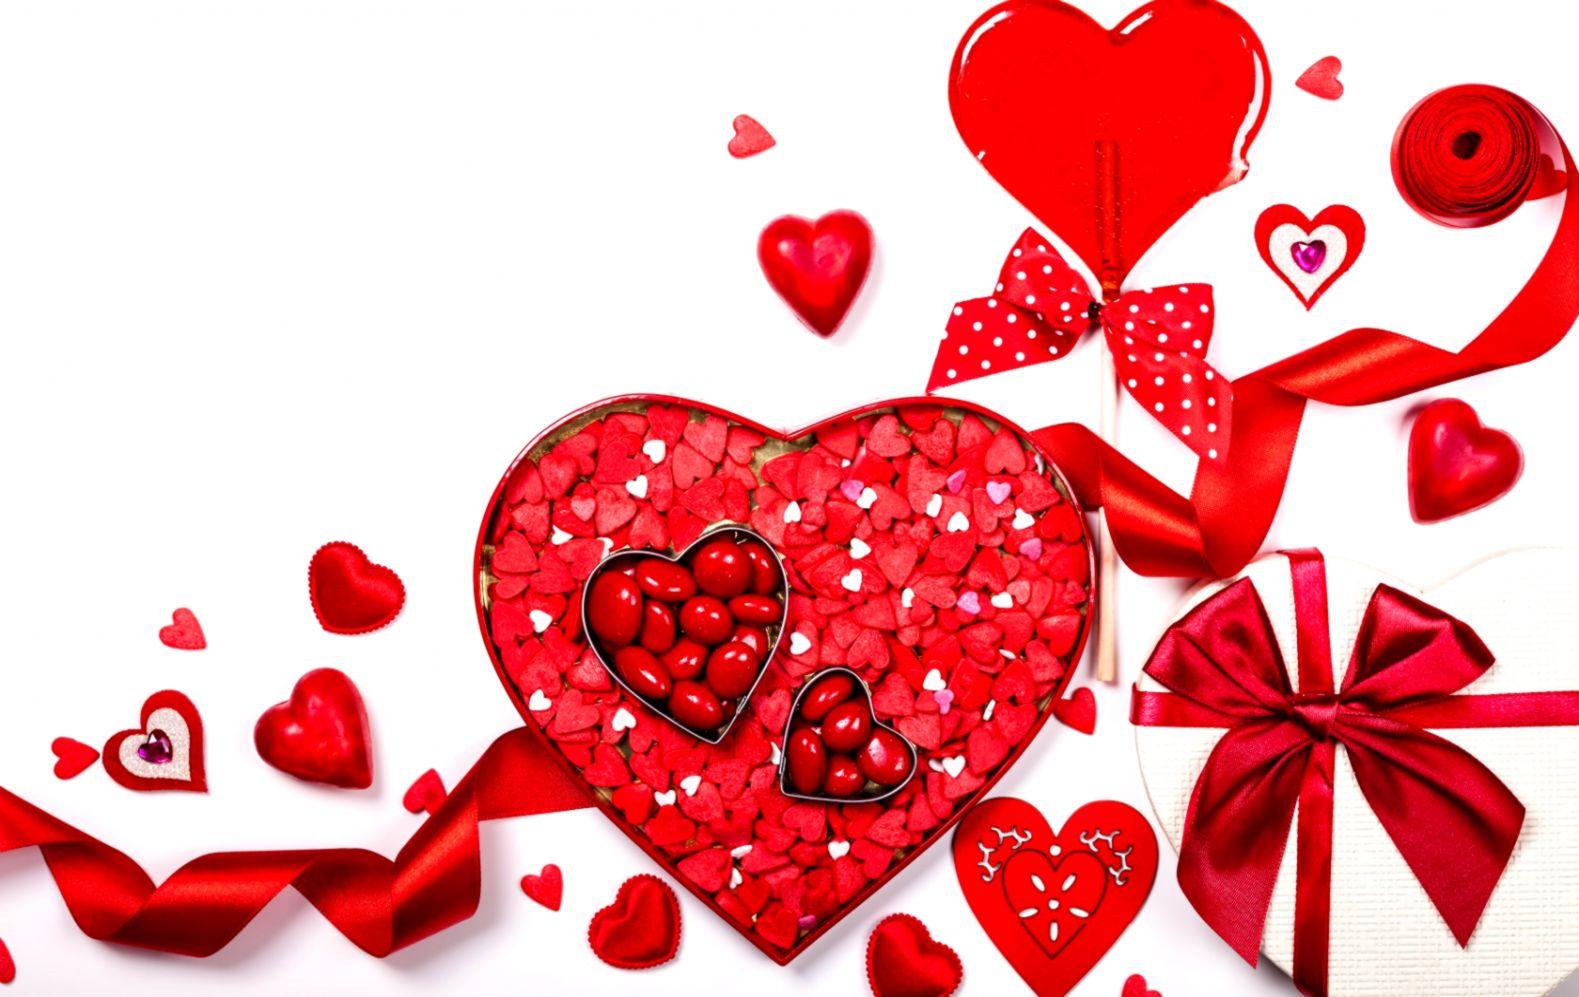 Red Roses Heart Love Hd Wallpaper Viva Wallpapers